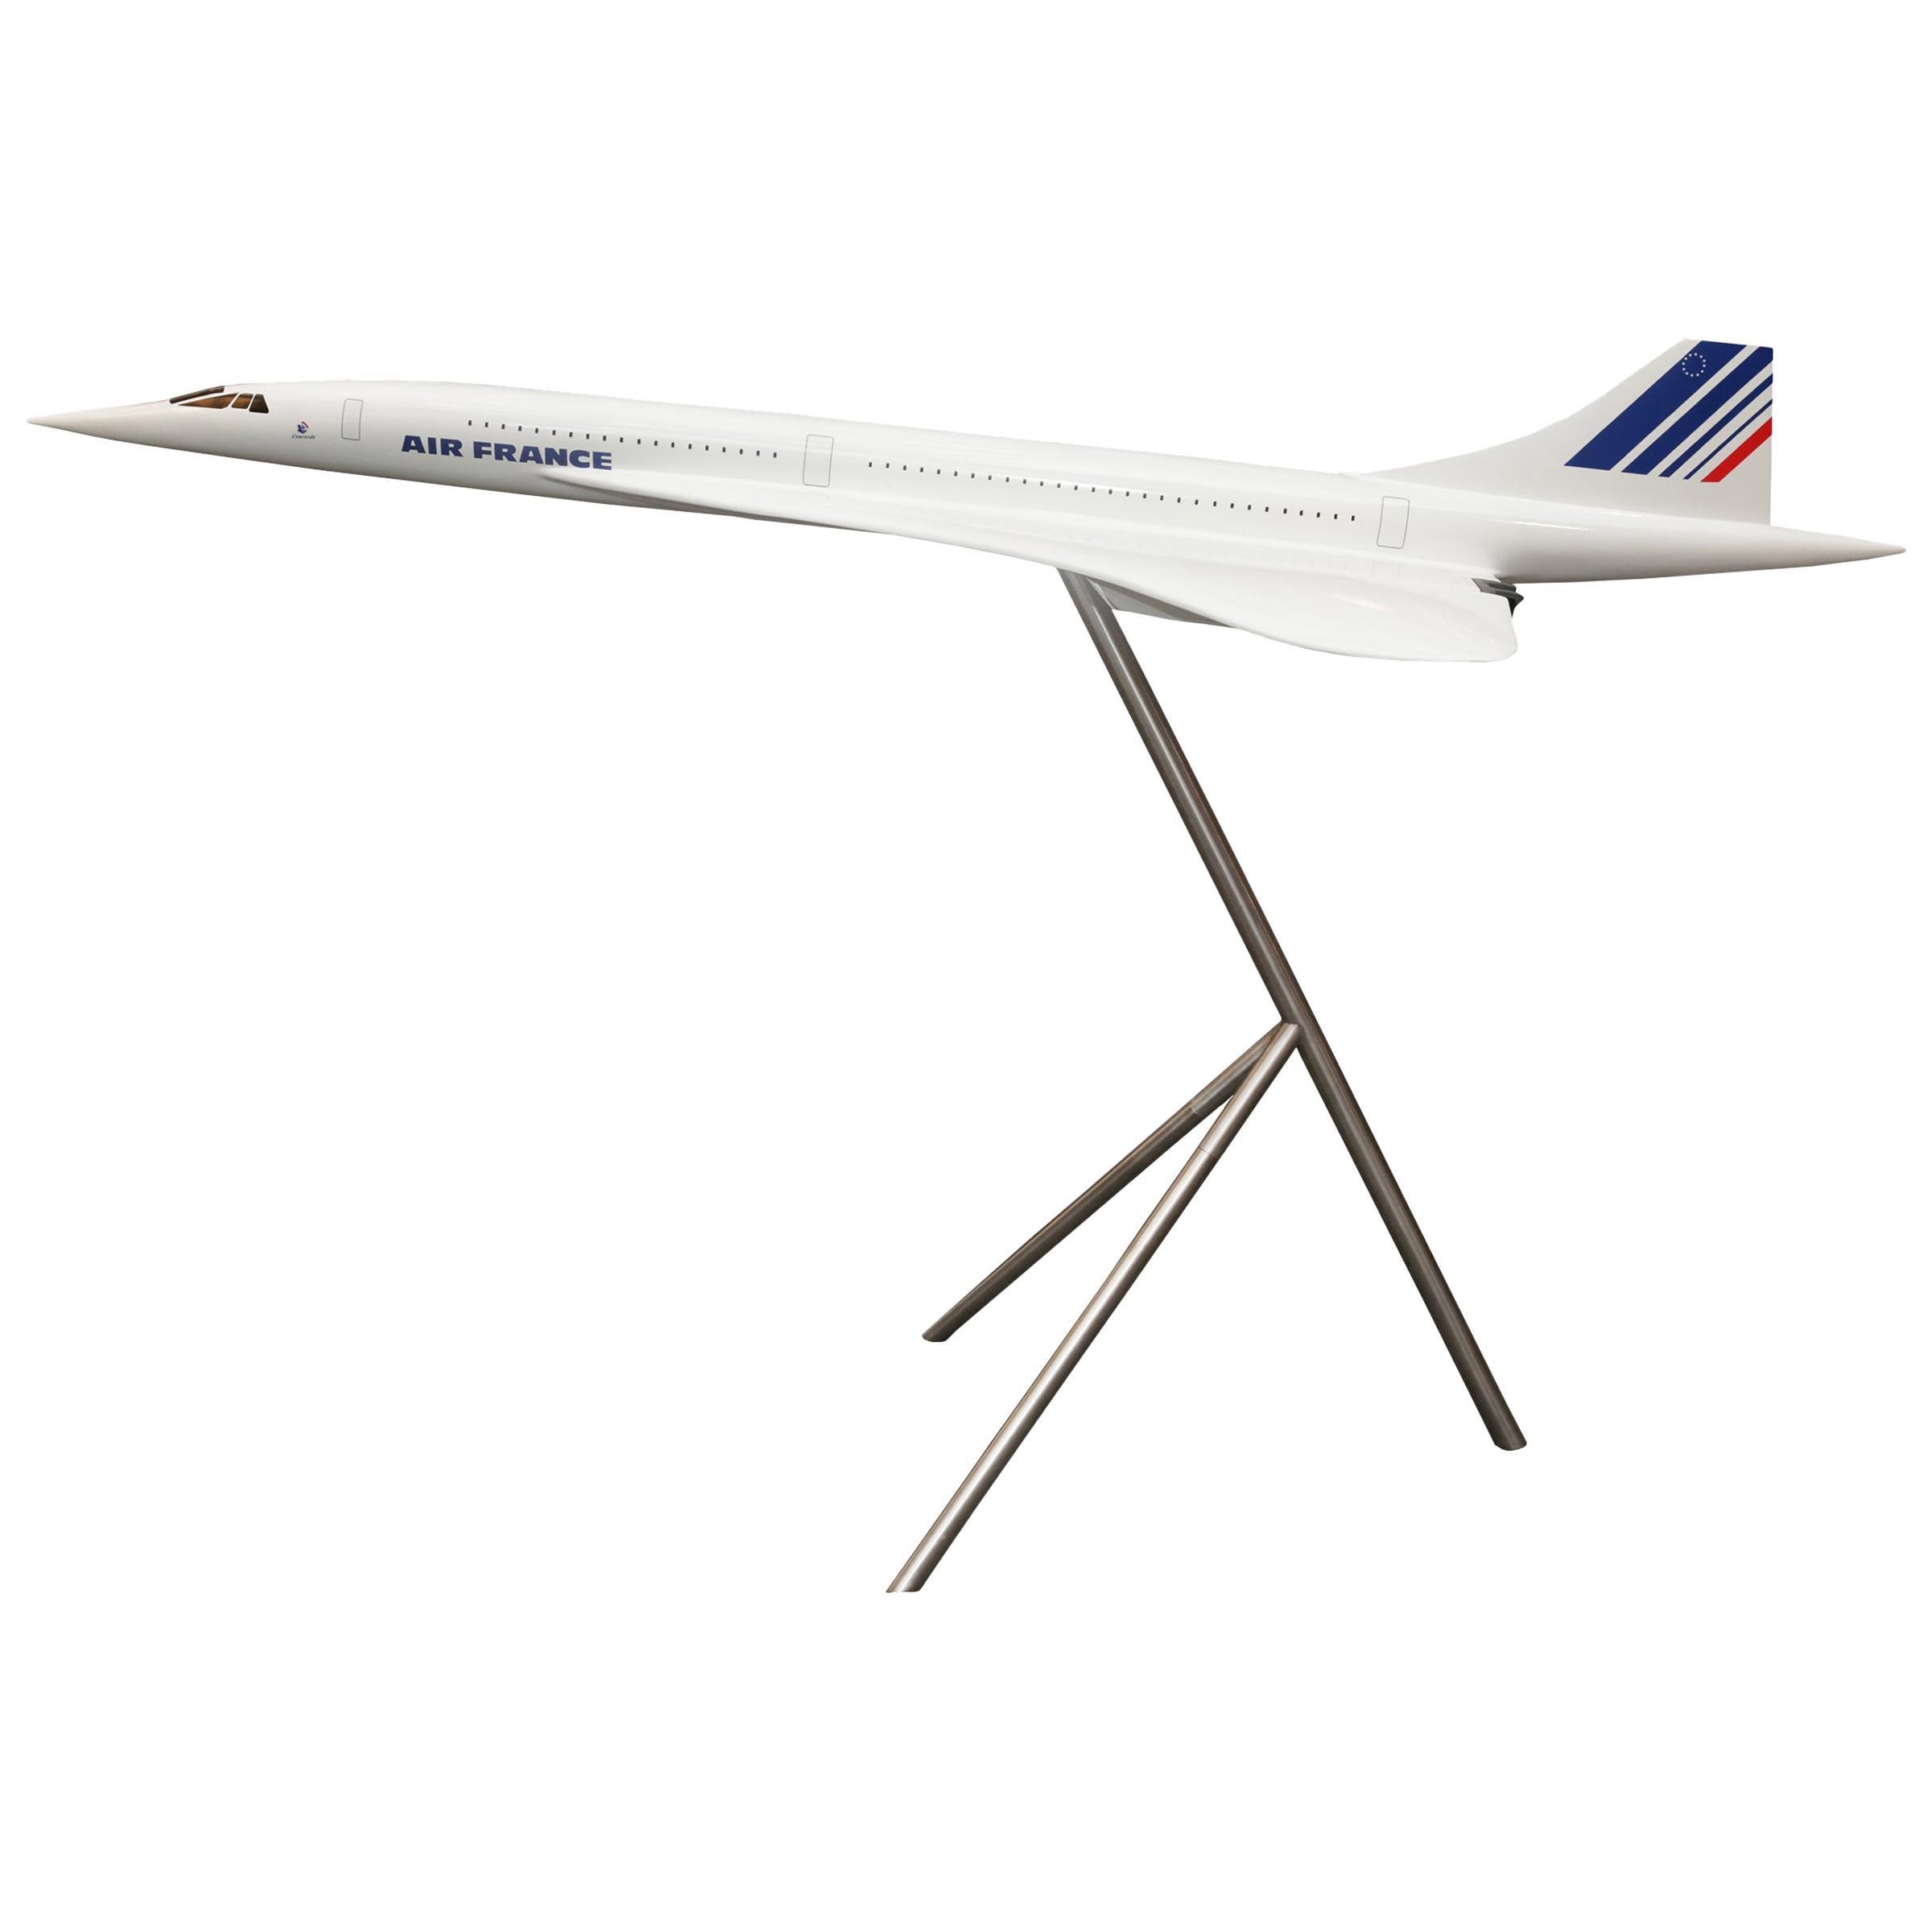 Sculpture Concorde Model Scale 1/36